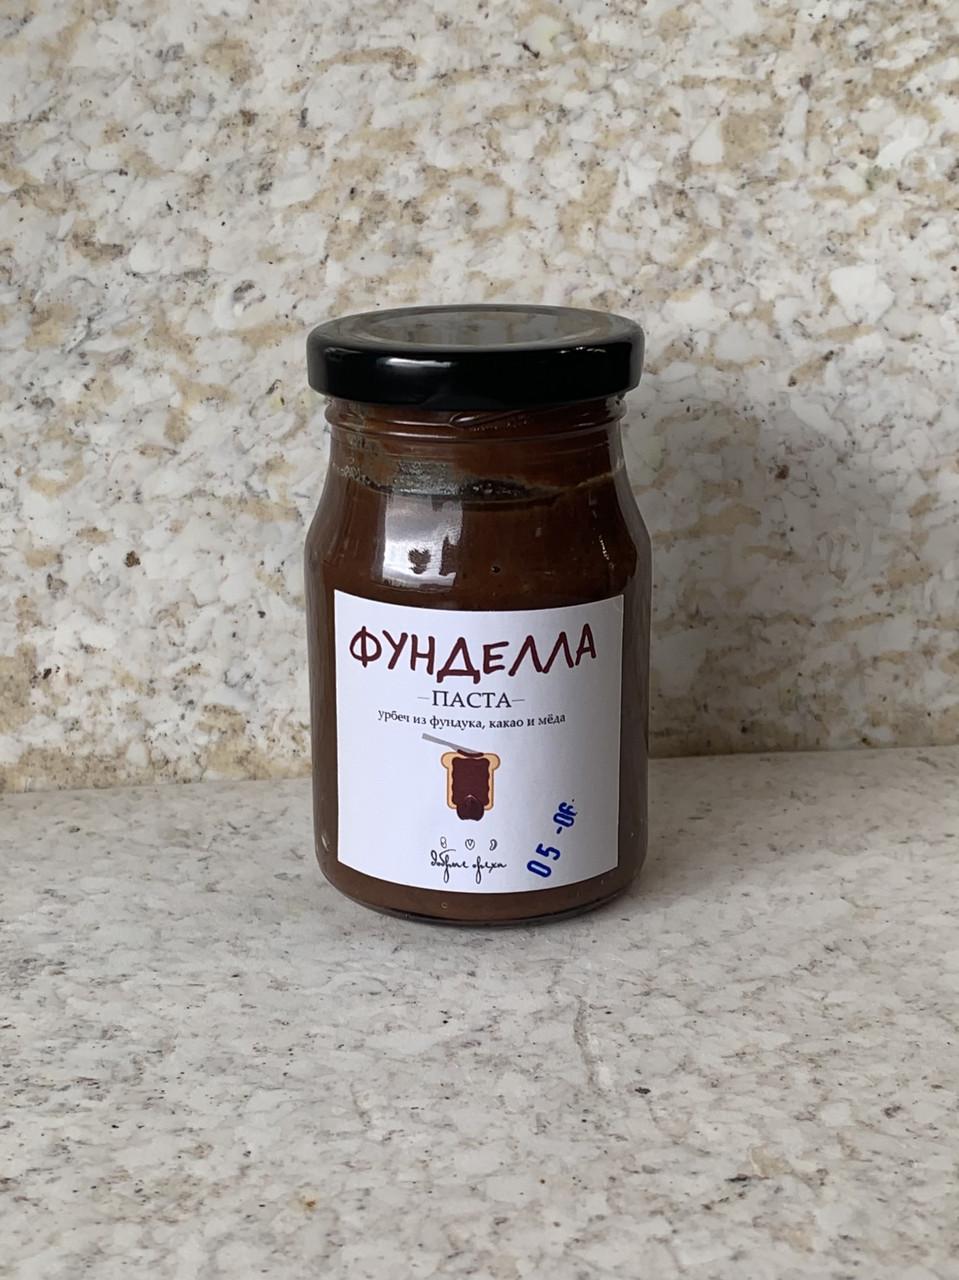 Ореховая паста Фунделла От 100 грамм. Добрехи